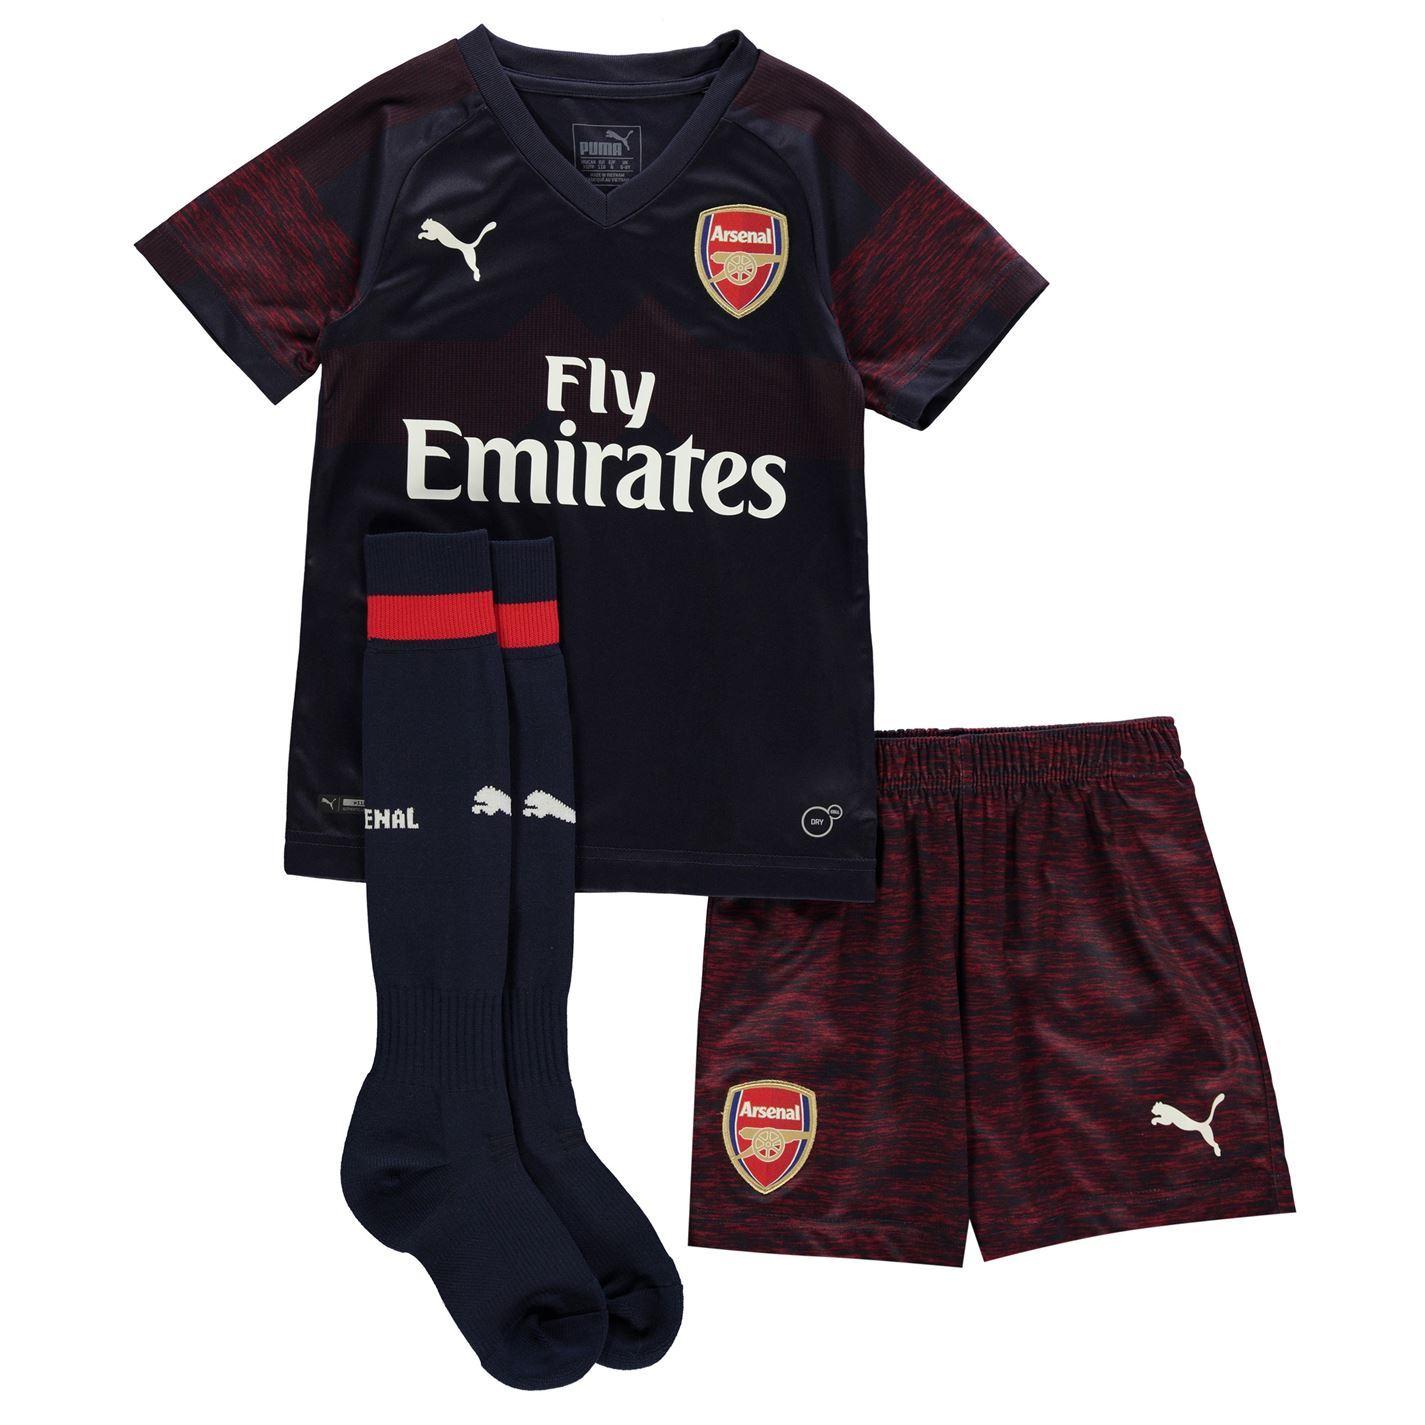 0733838fa63 Puma Arsenal Away Mini Kit 2018 2019 Infants Navy Football Soccer Strip